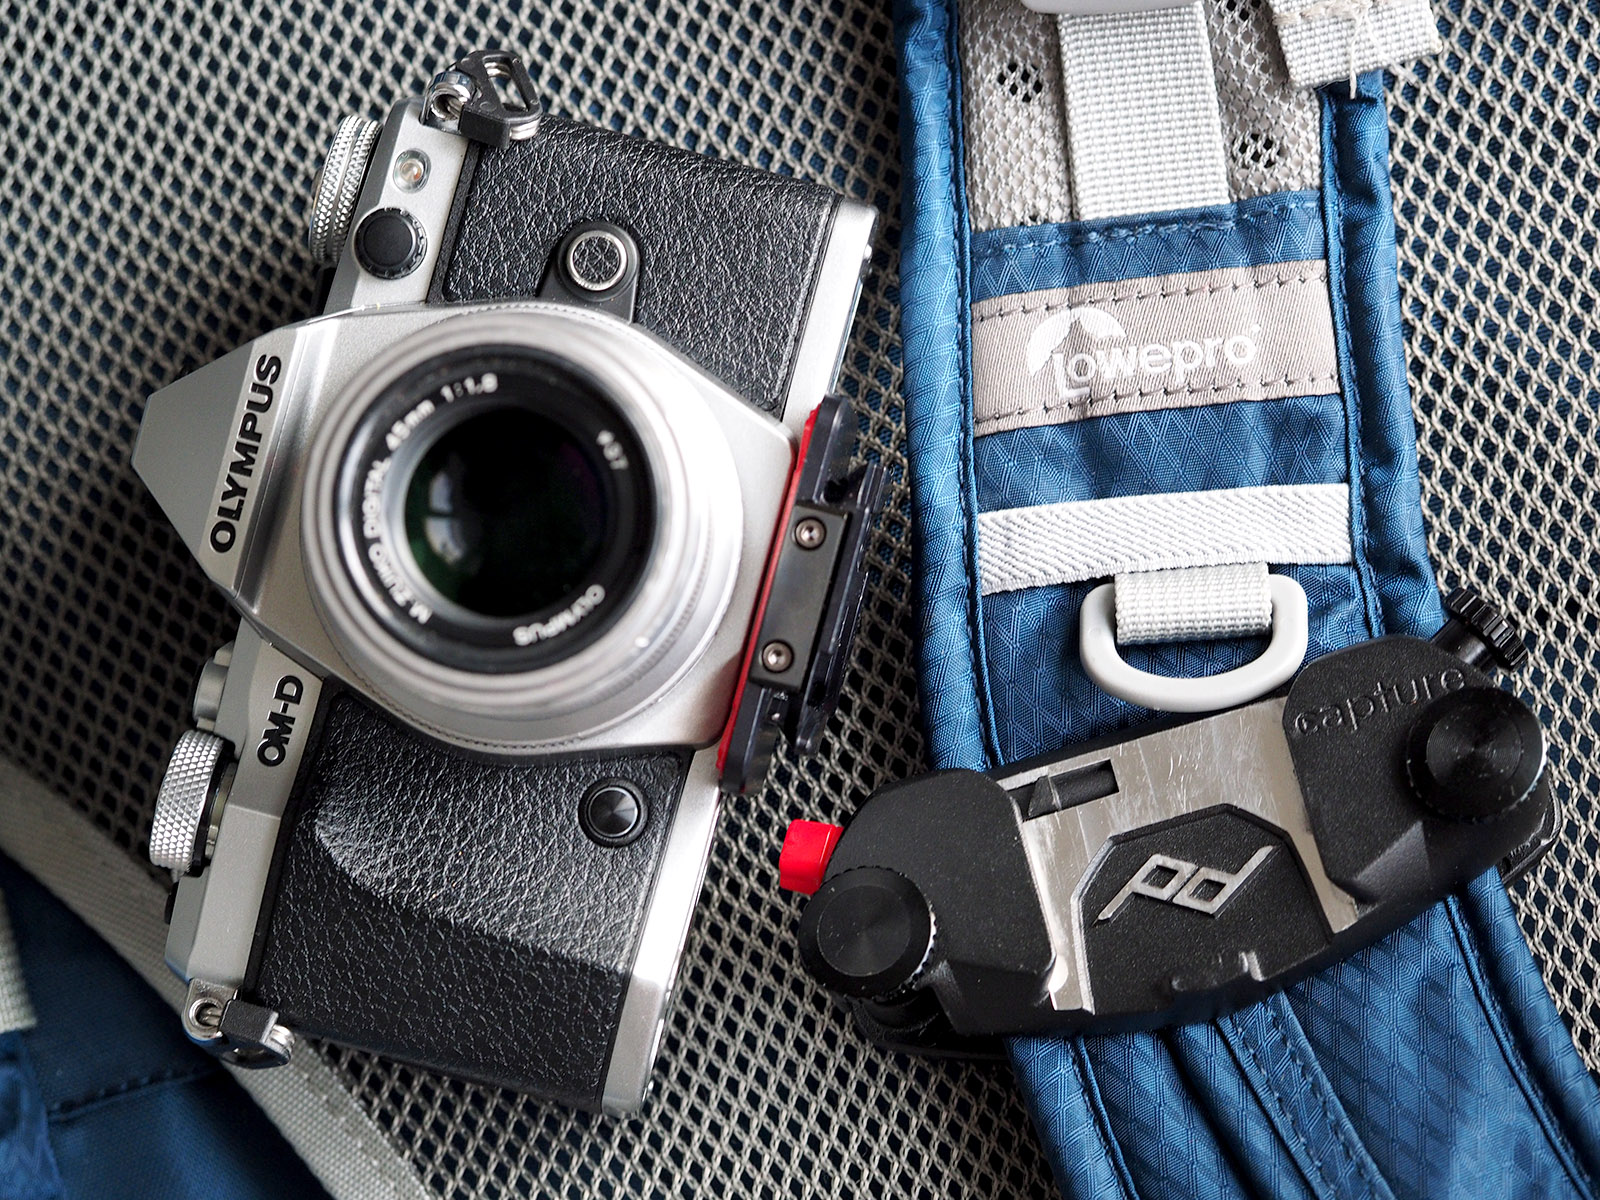 Capture zamocowany na ramieniu plecaka fotograficznego